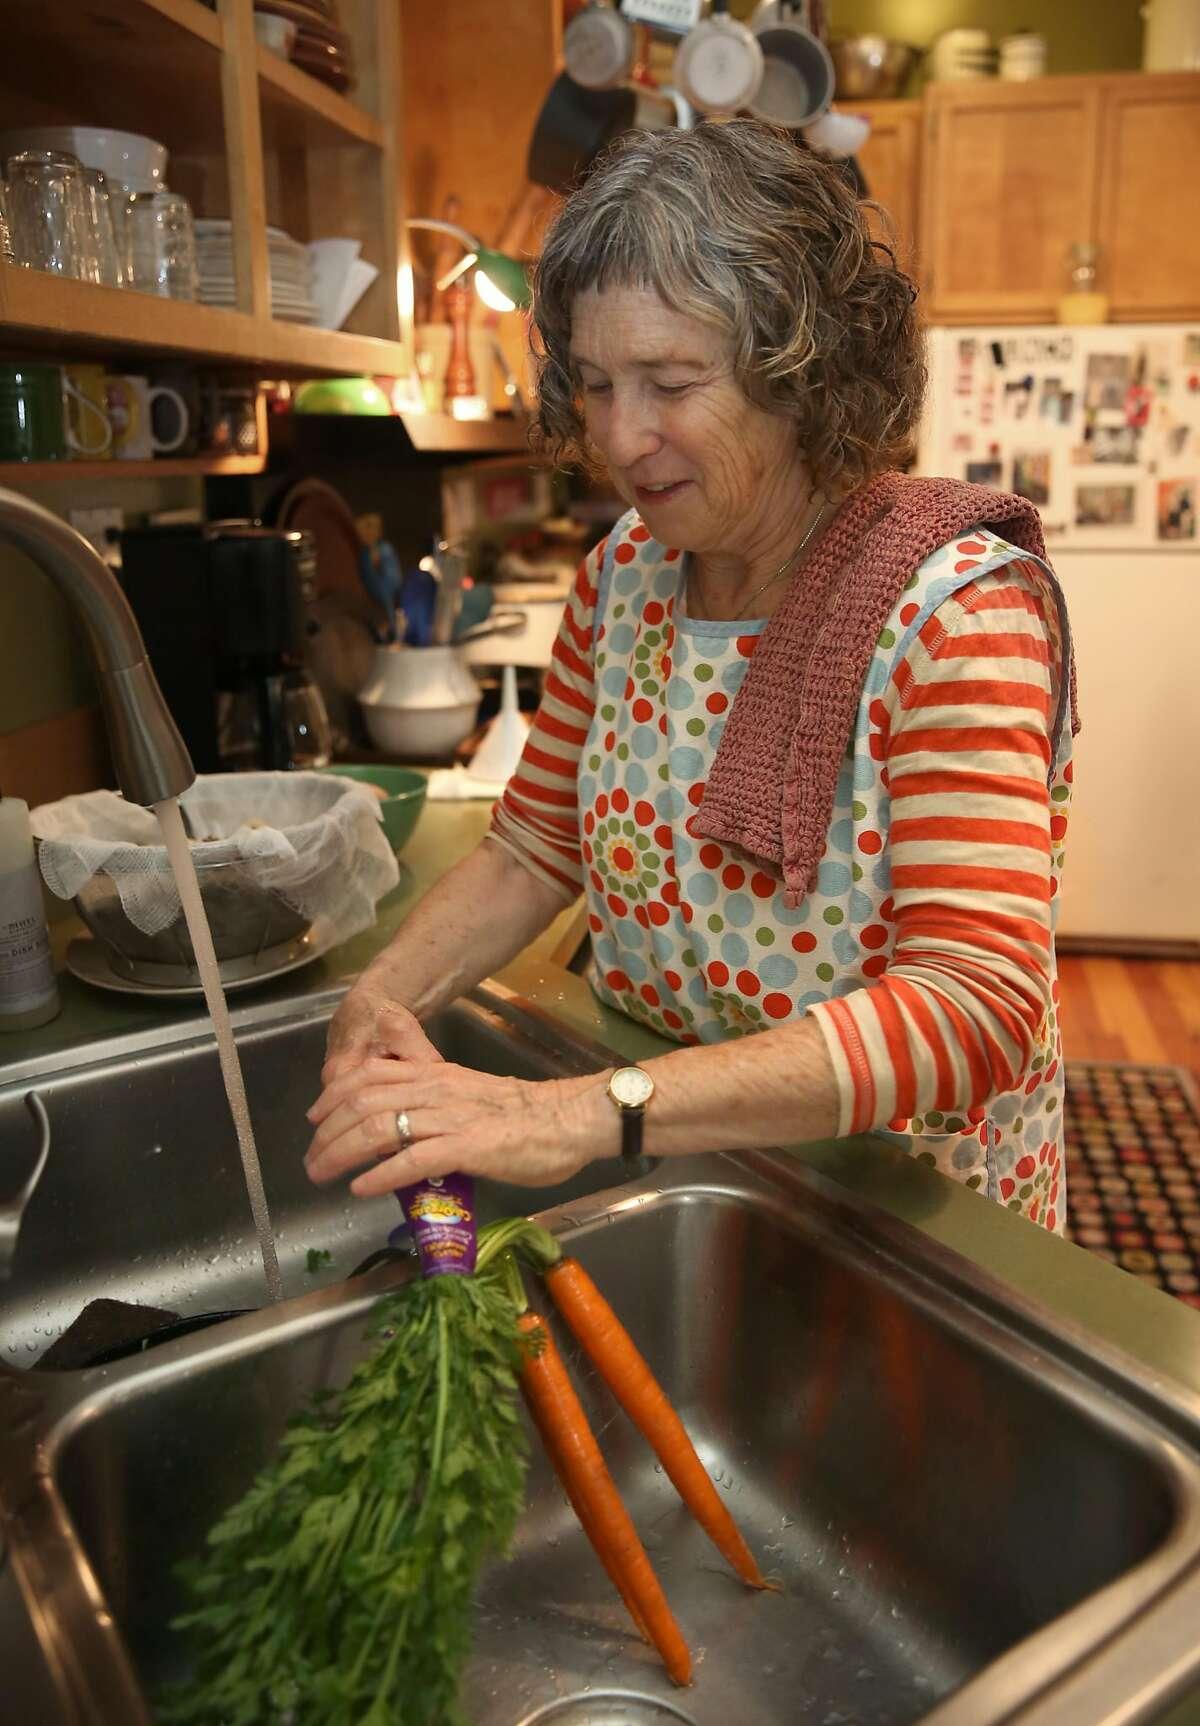 San Francisco School cook Patty Corwin washes carrots as she shows how to make matzo ball soup in San Francisco, California, on thursday, march 10, 2016.